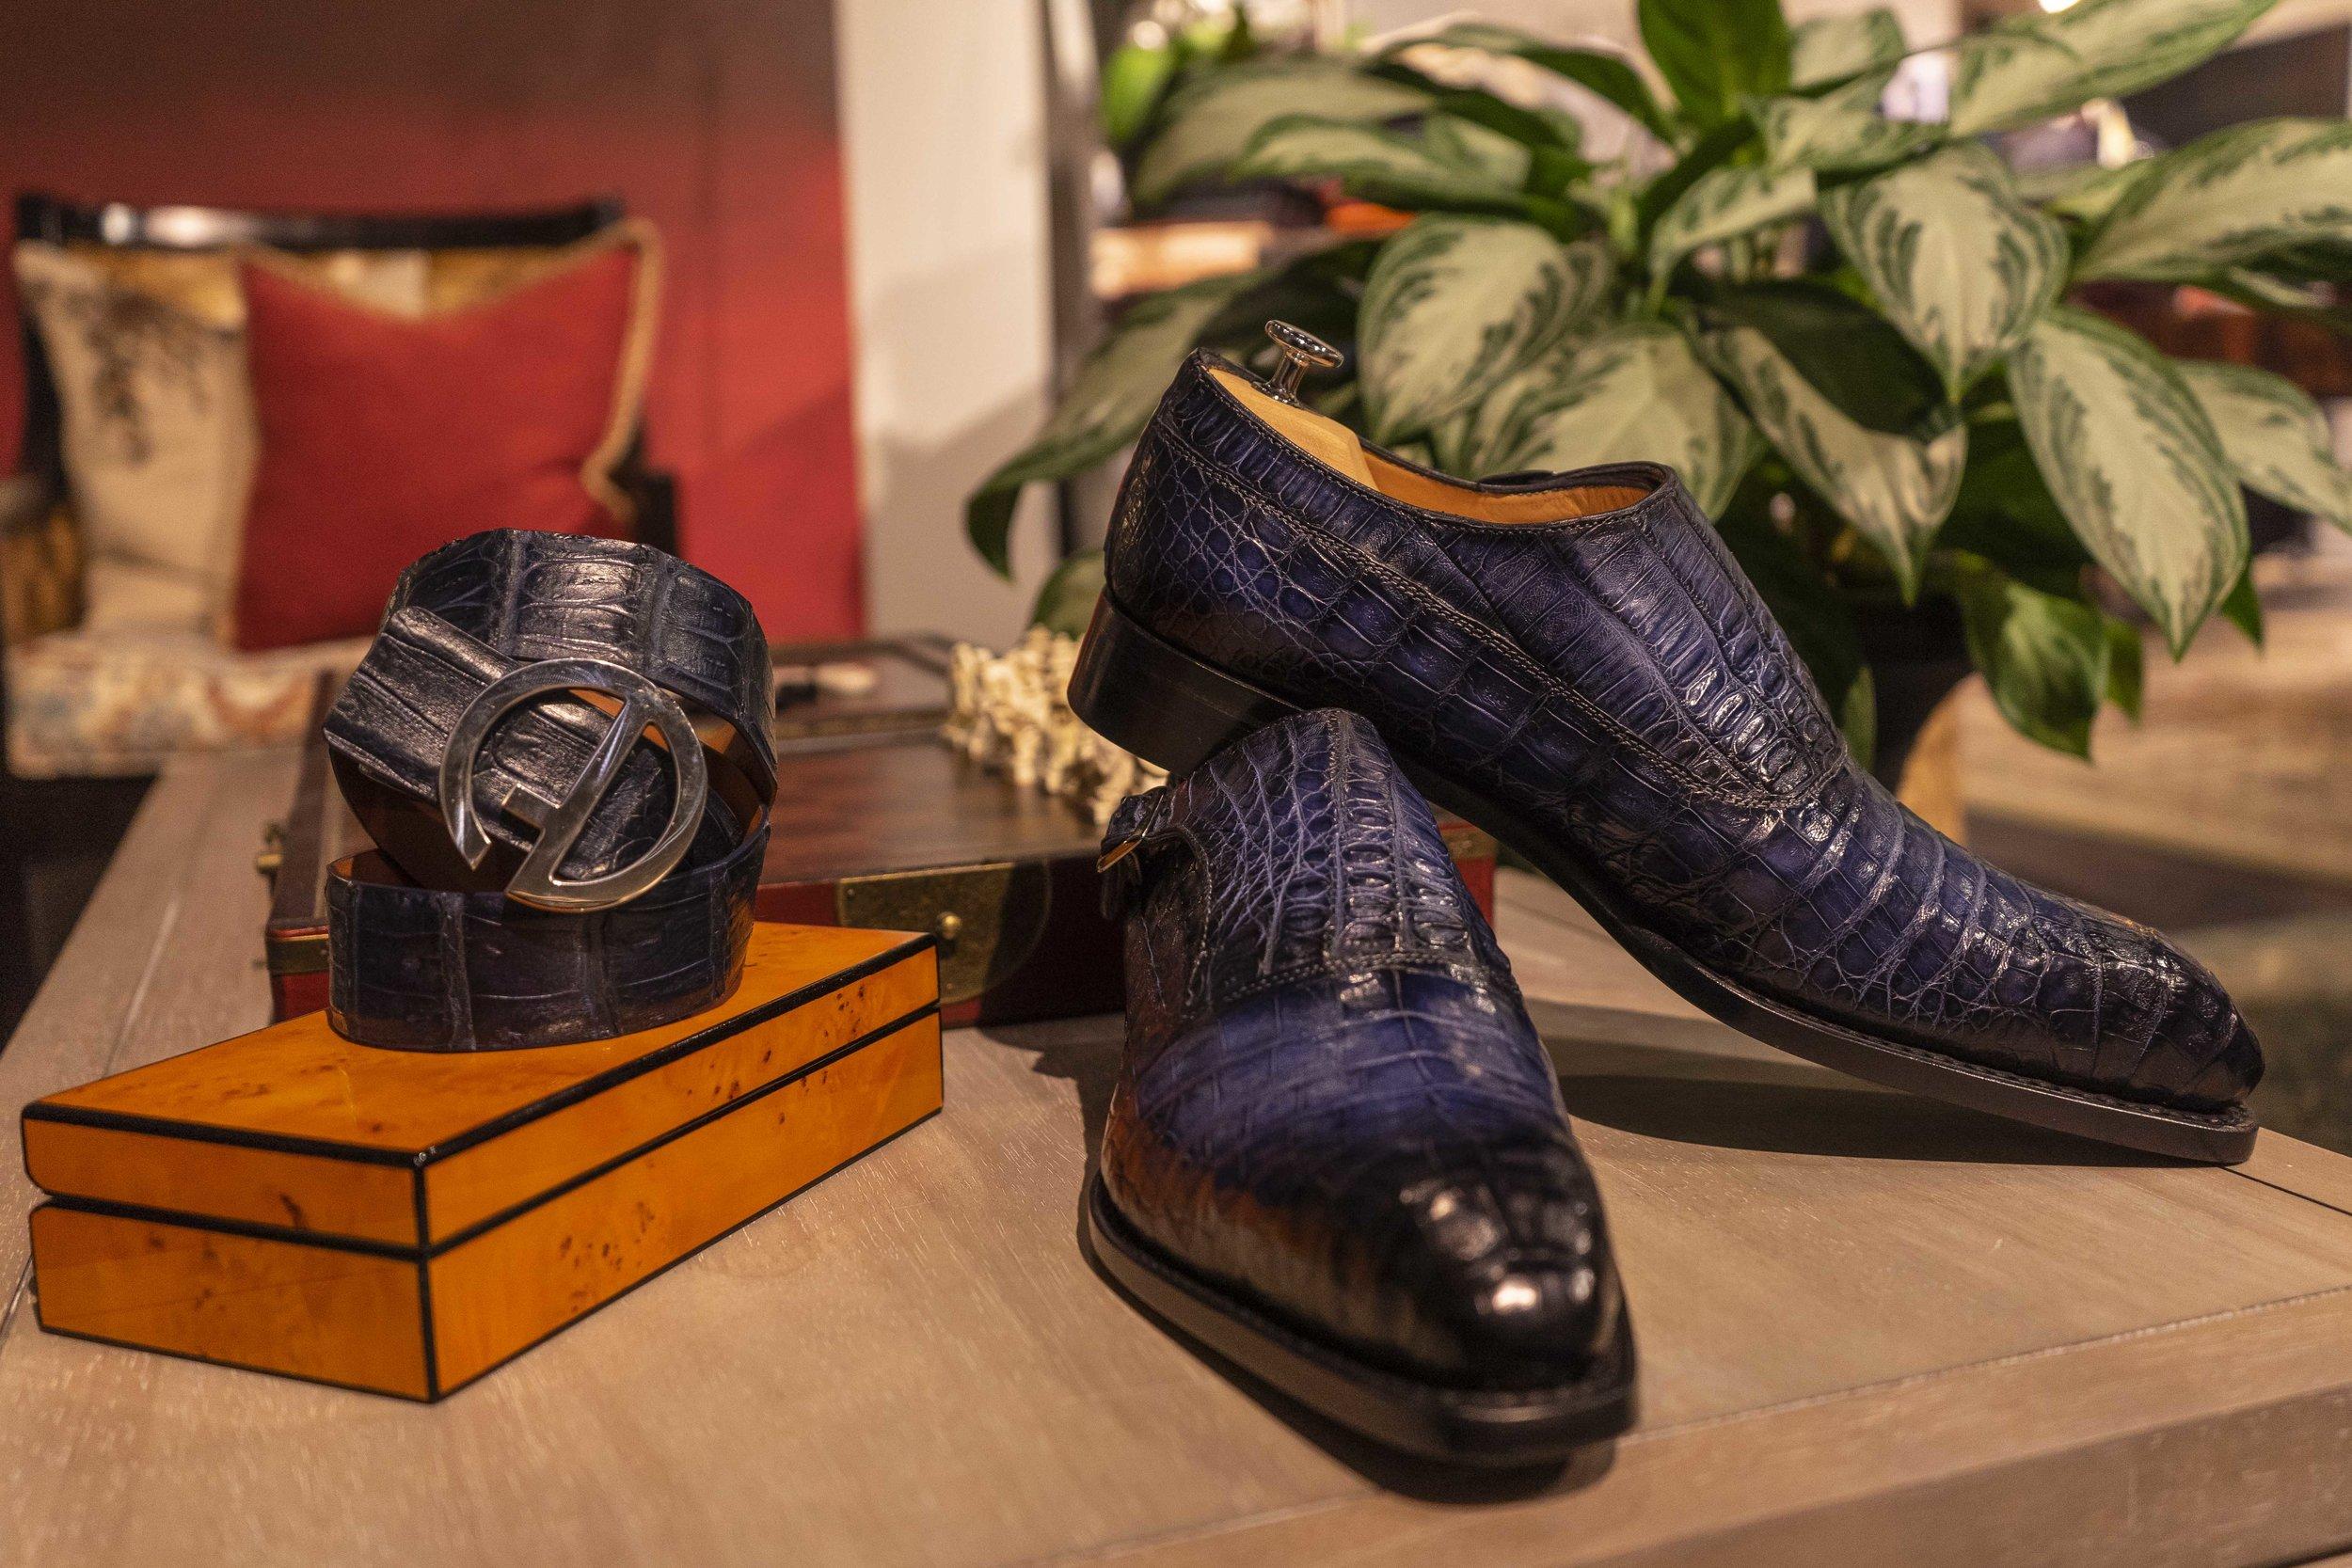 DG_bespoke_shoes_blue croc_8.jpg